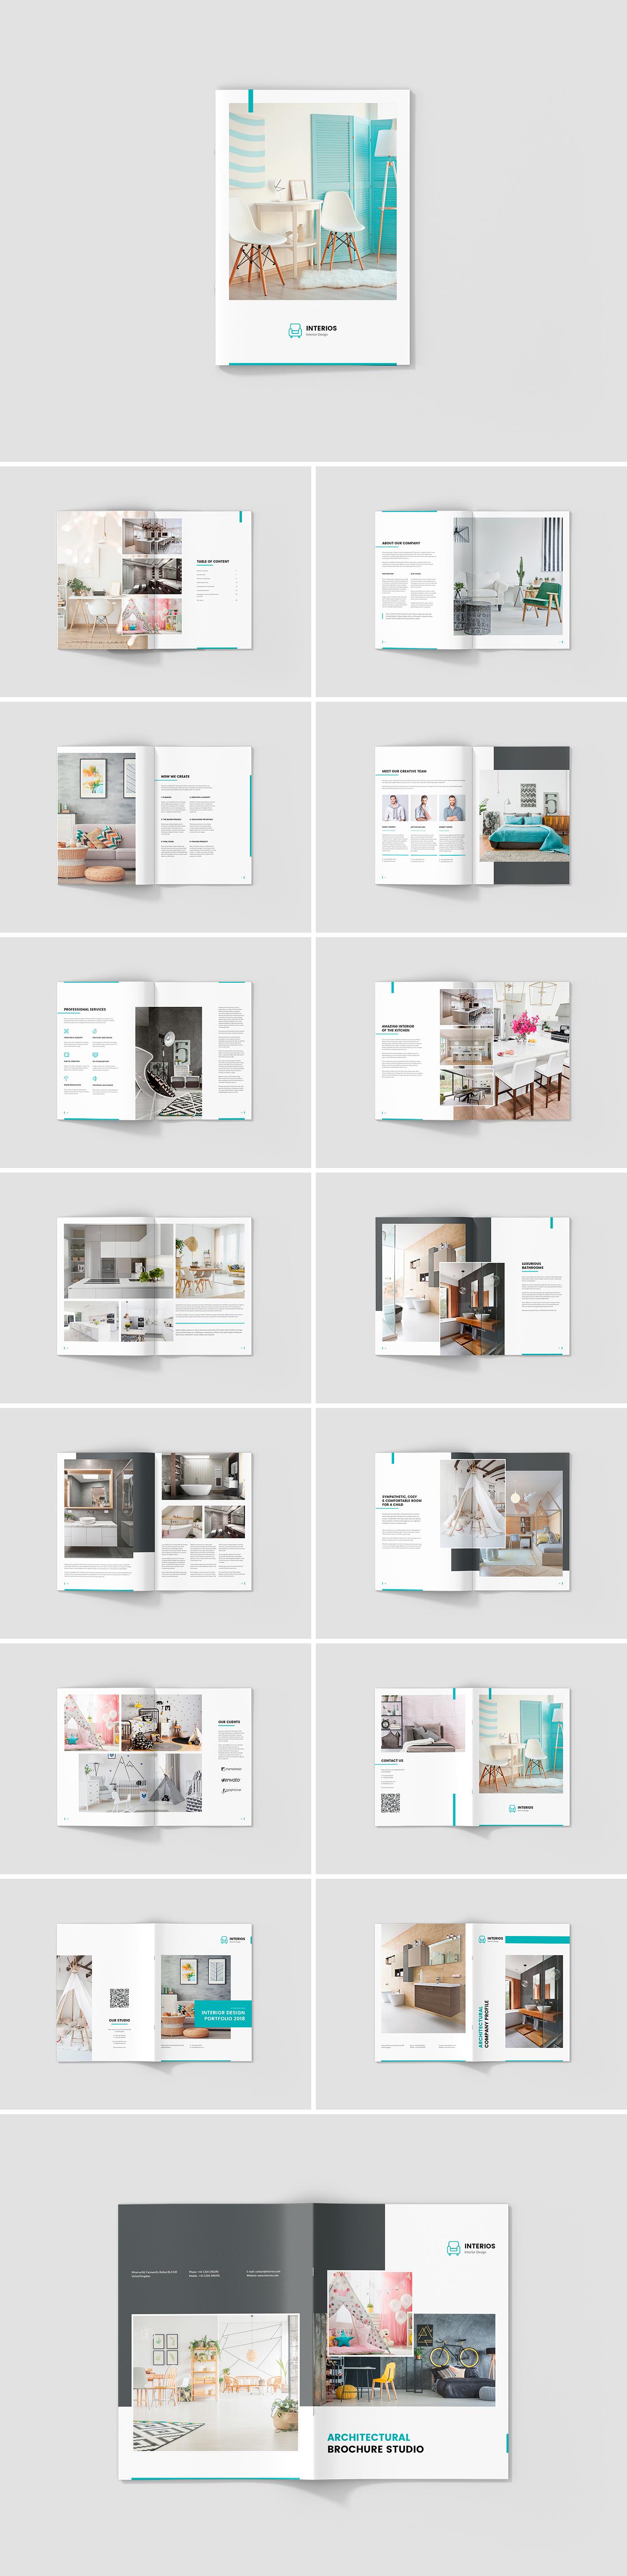 Interios Interior Design Brochures Print Templates On Behance